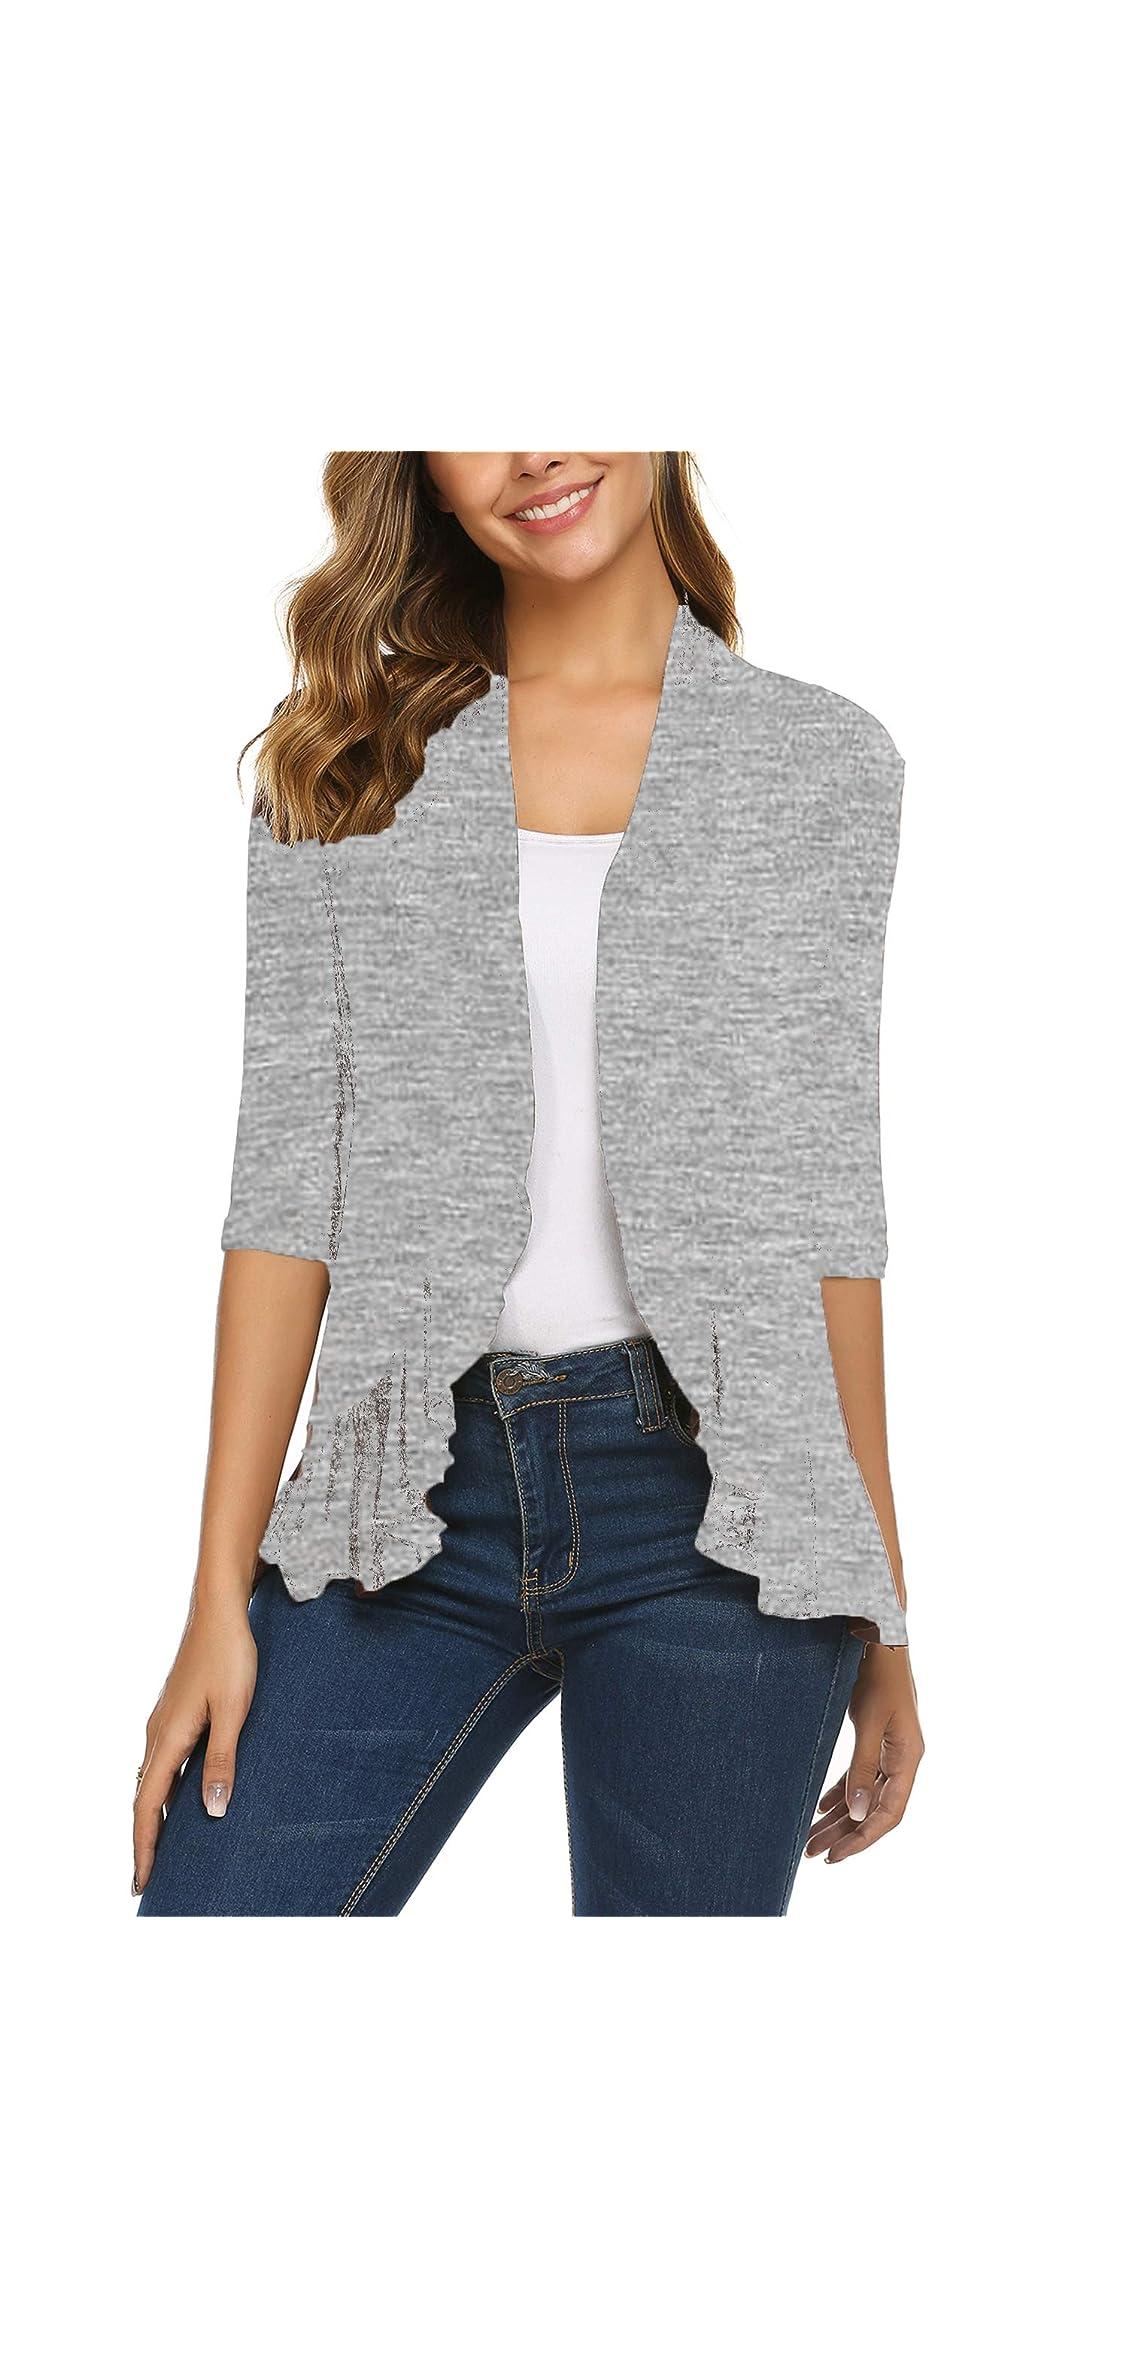 Women's Open Front Cardigan / Sleeve Draped Ruffles